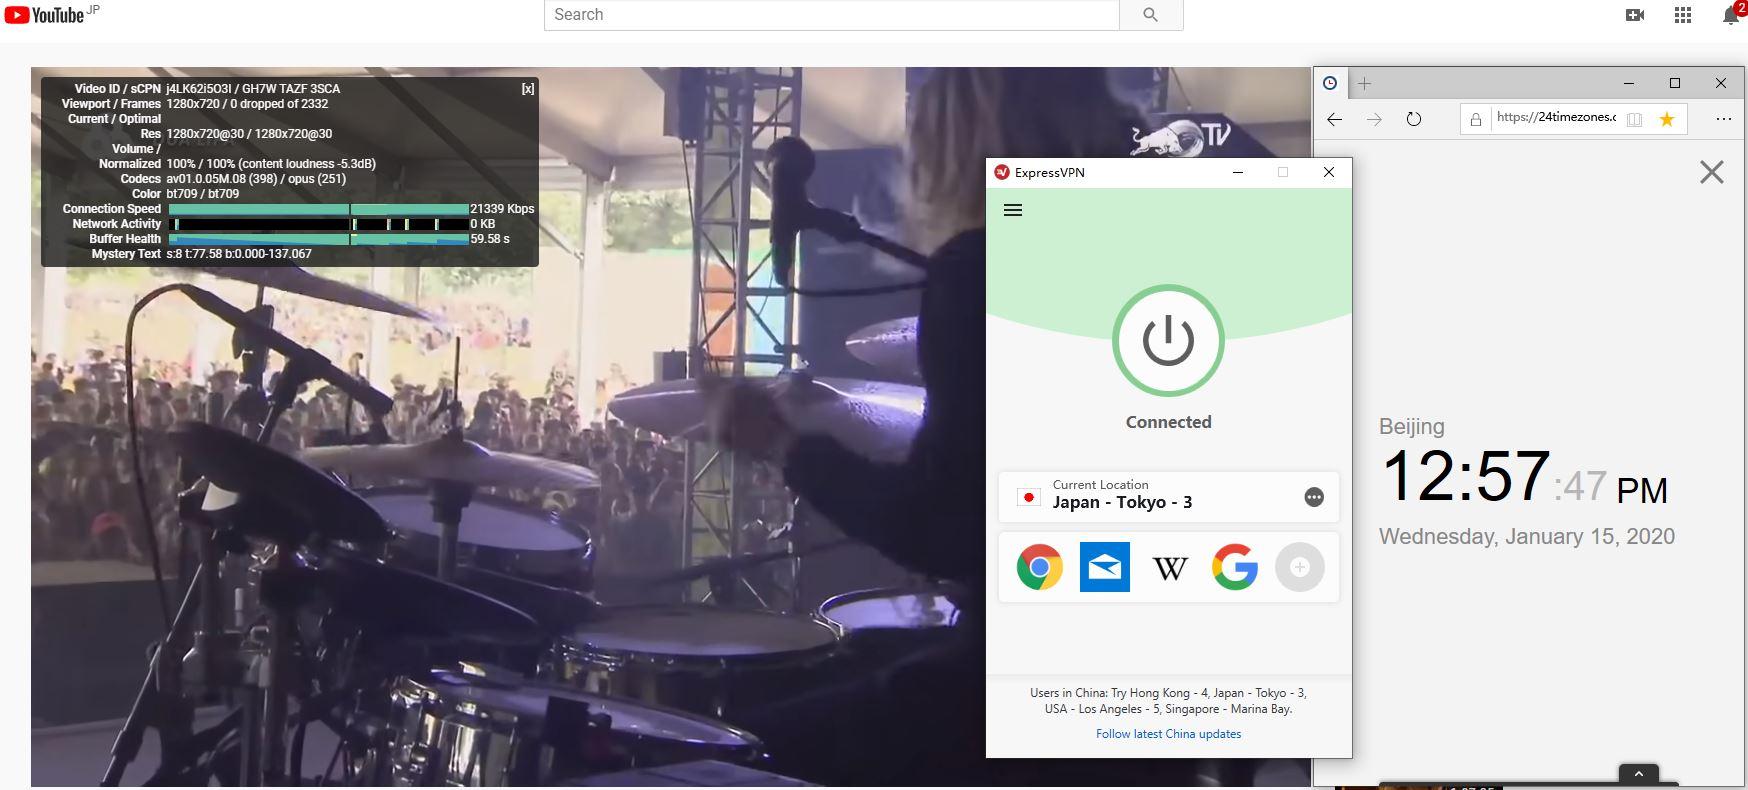 Windows10 ExpressVPN Japan Tokyo - 3 中国VPN翻墙 科学上网 YouTube连接速度 VPN测速 - 20200115